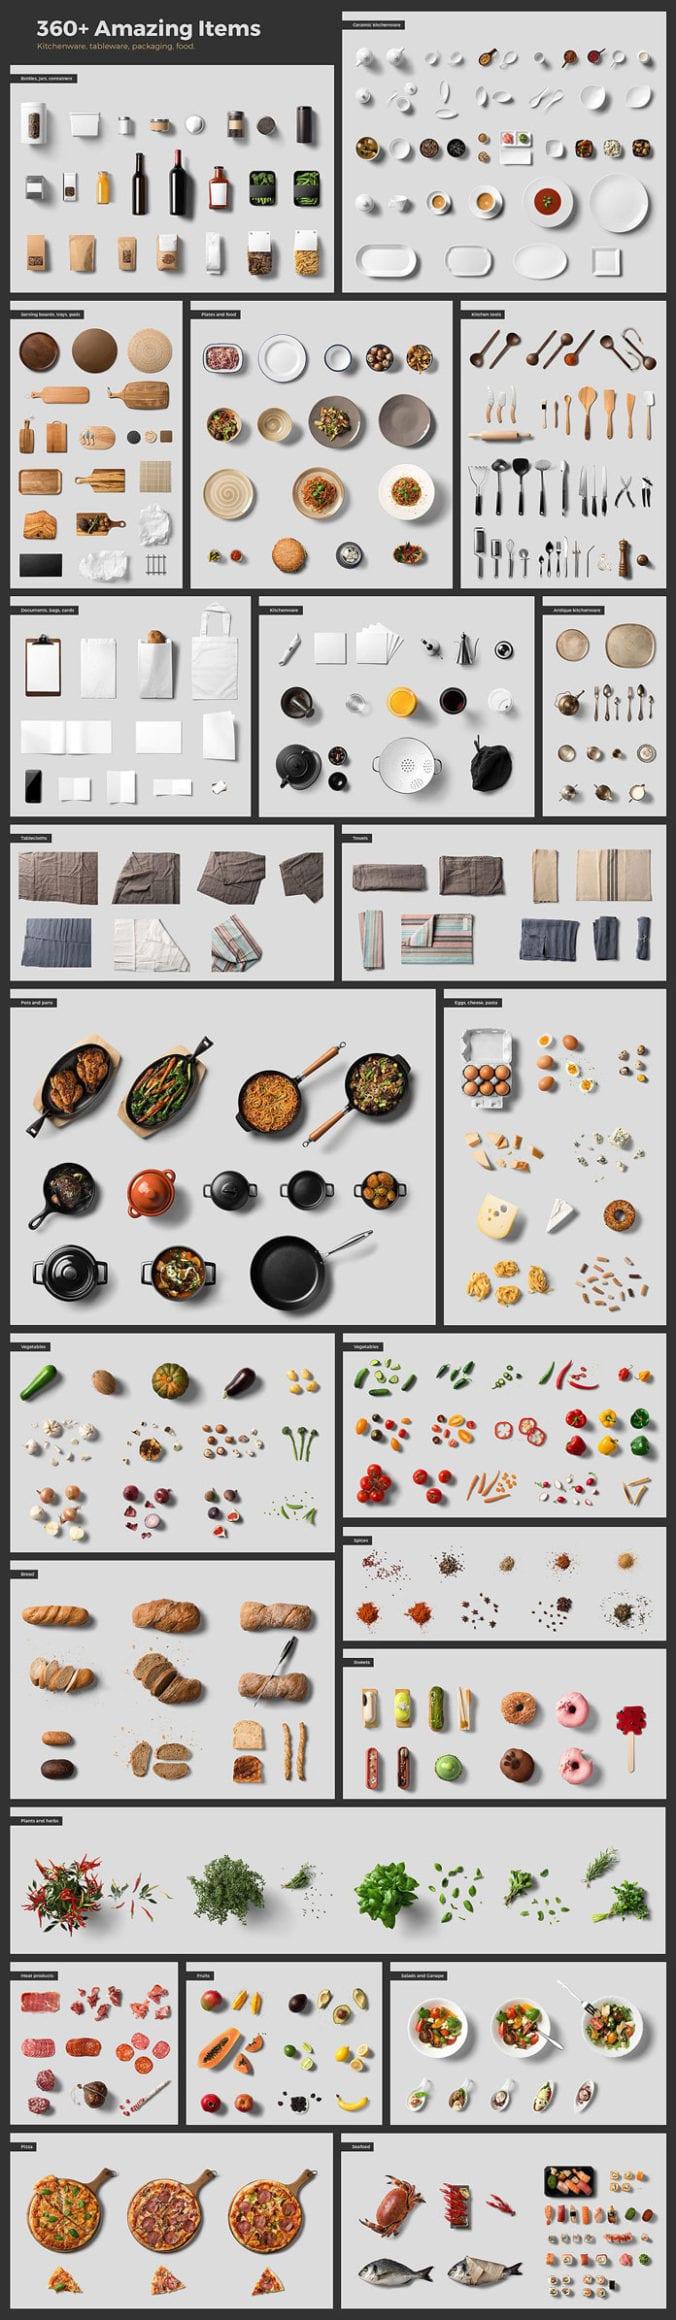 Kitchen-items